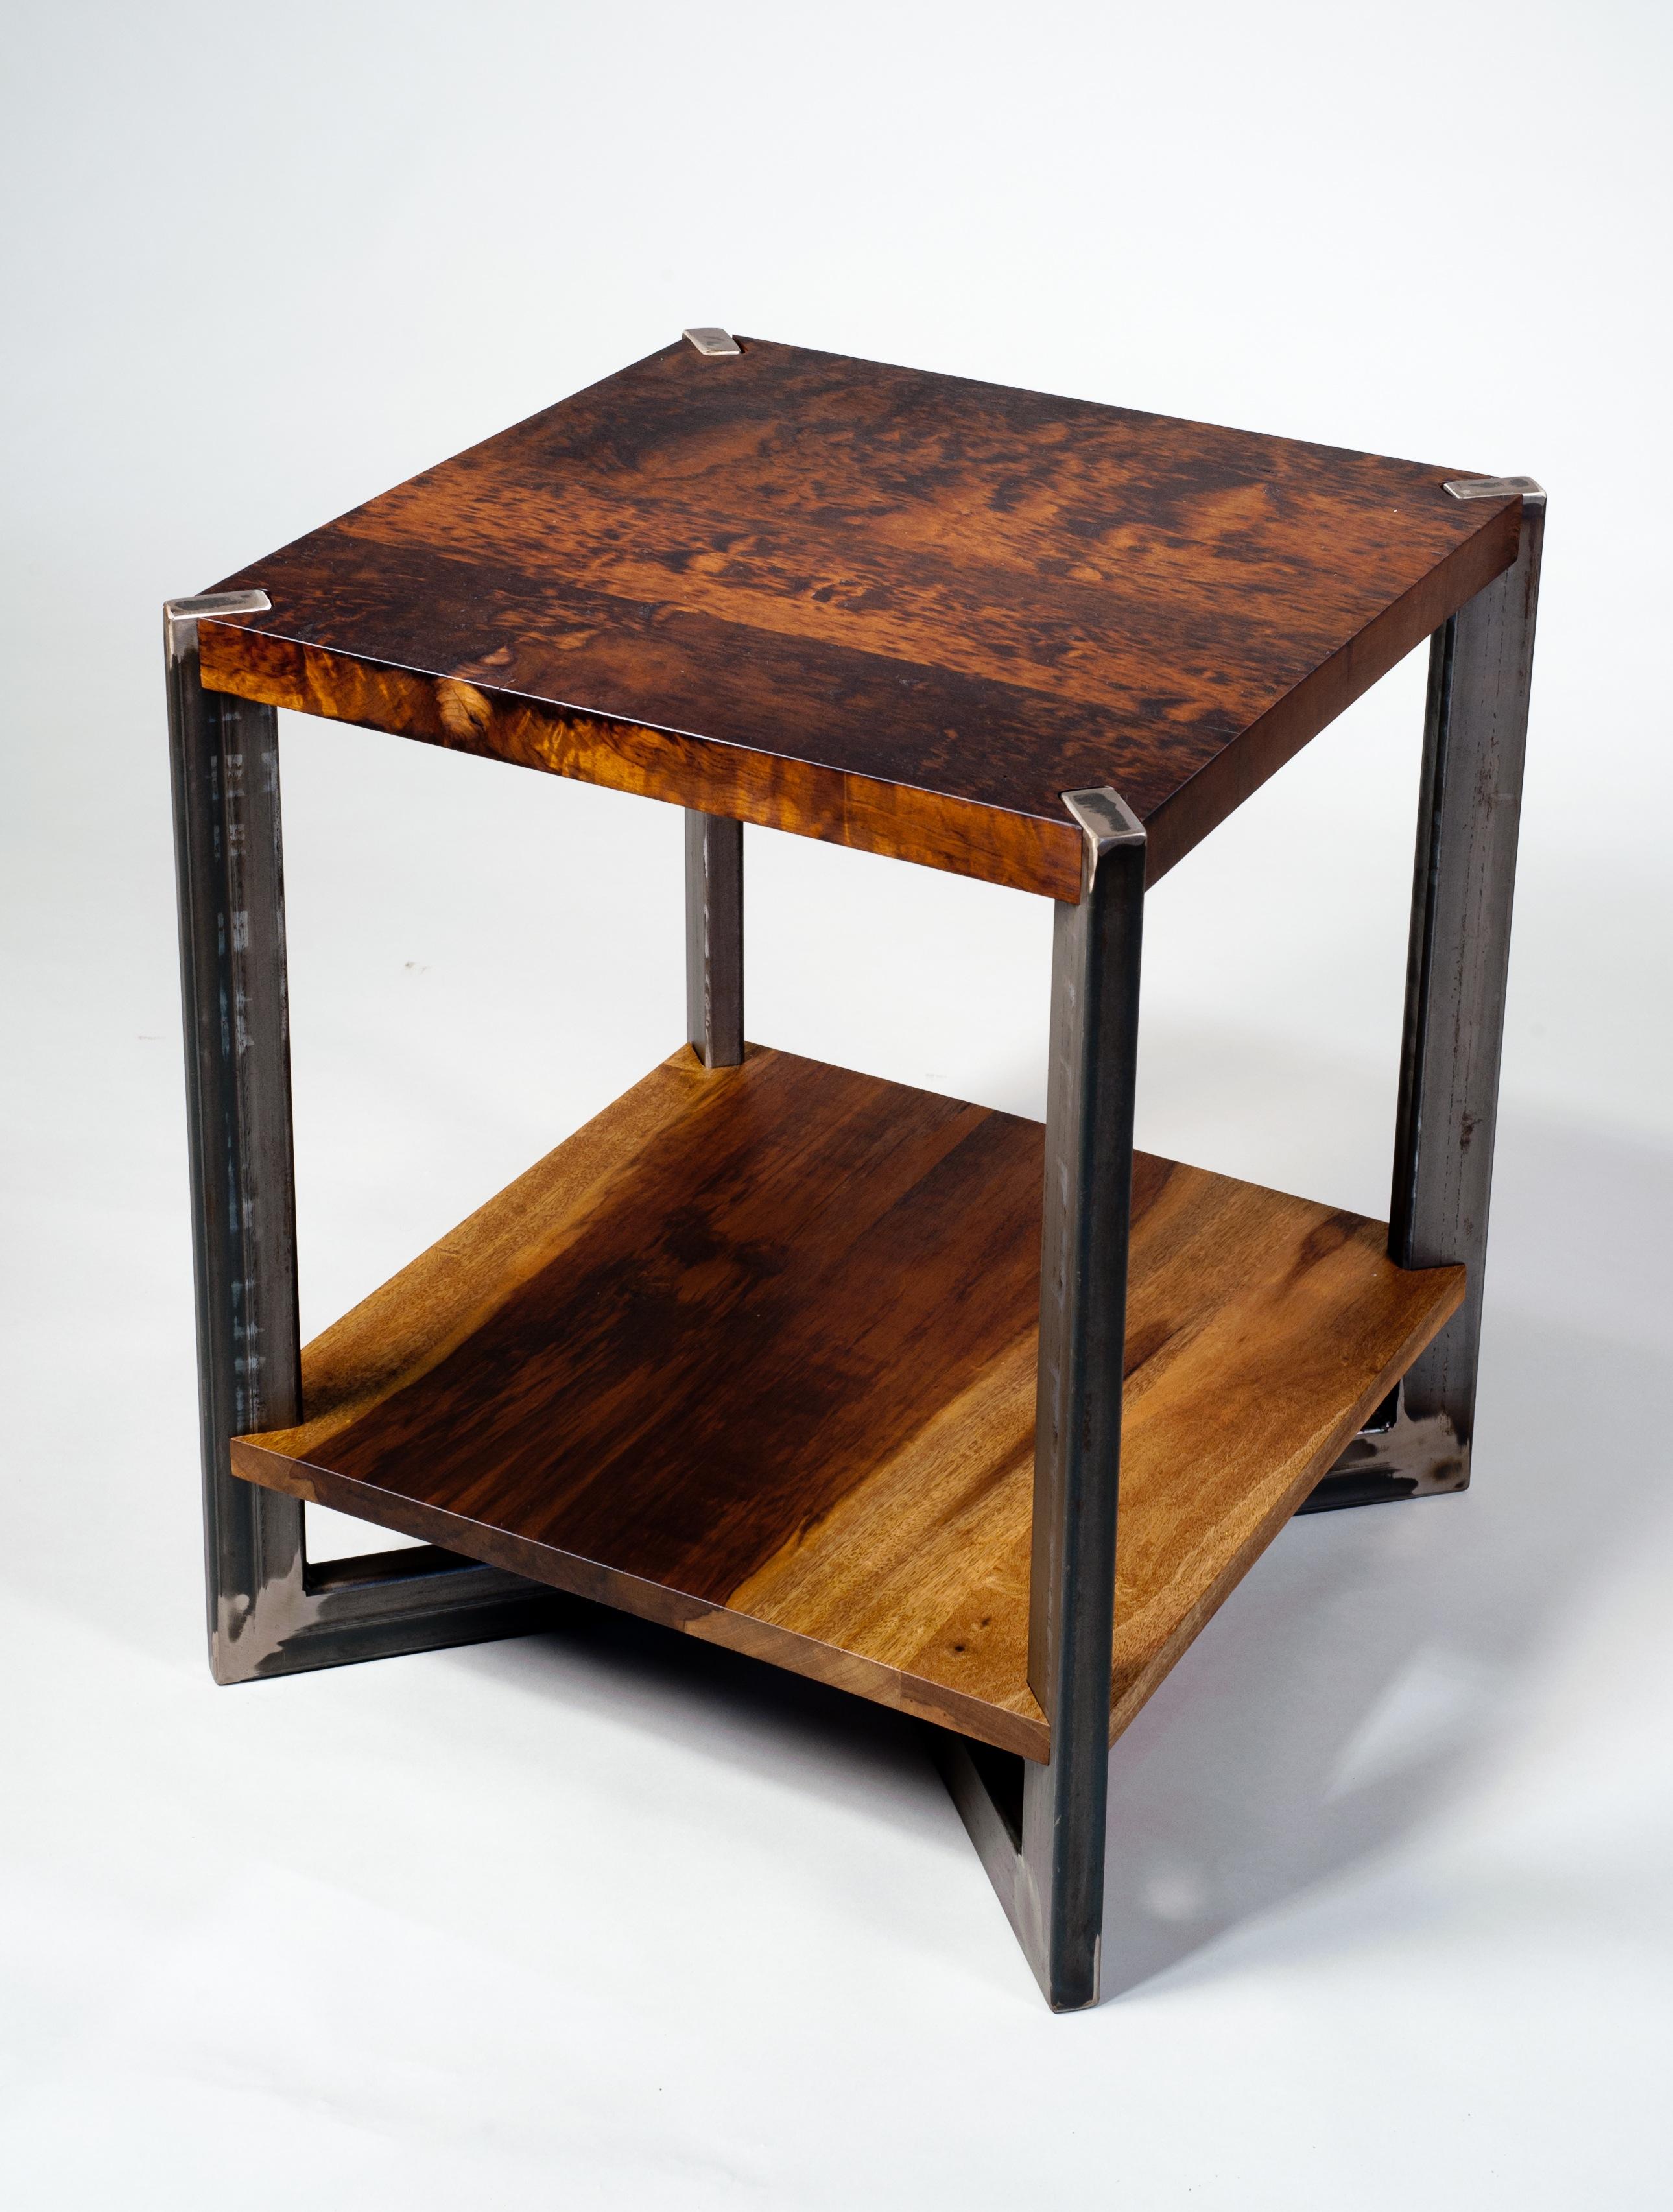 Trevor Thurow Furniture Design  Custom Furniture and Design  Page 3